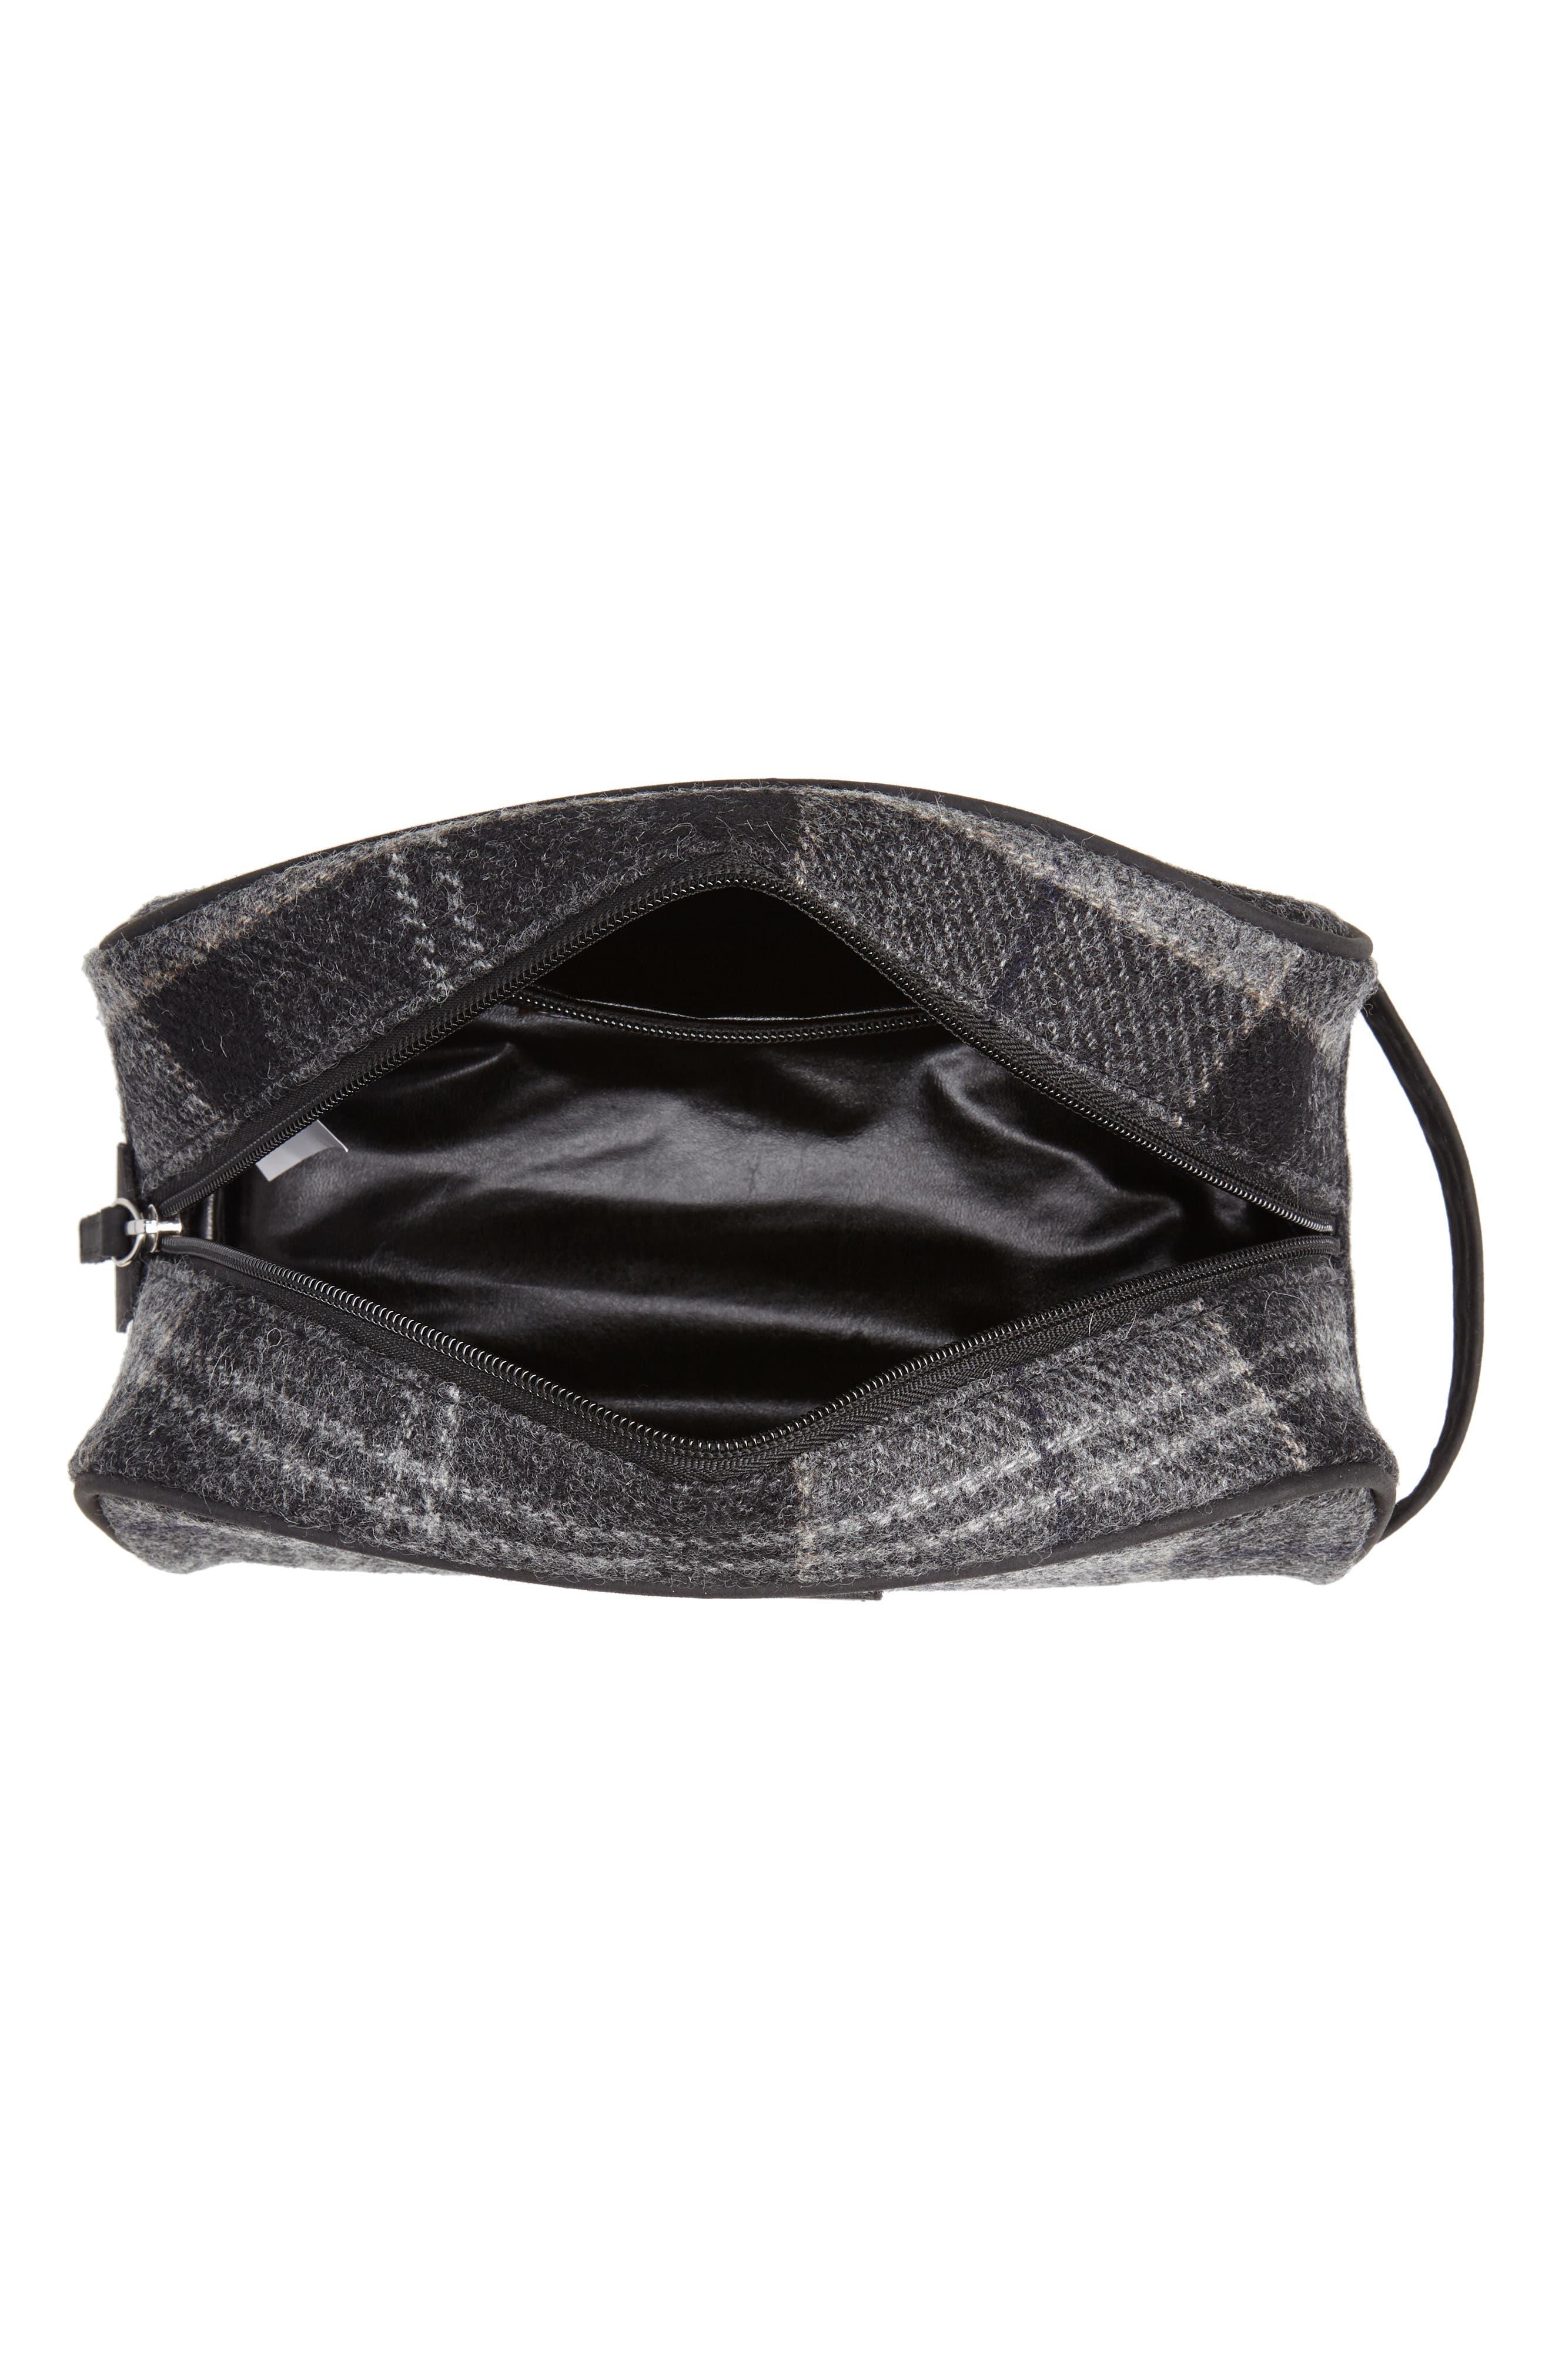 Shadow Tartan Wool Travel Kit,                             Alternate thumbnail 3, color,                             BLACK/ GREY TARTAN